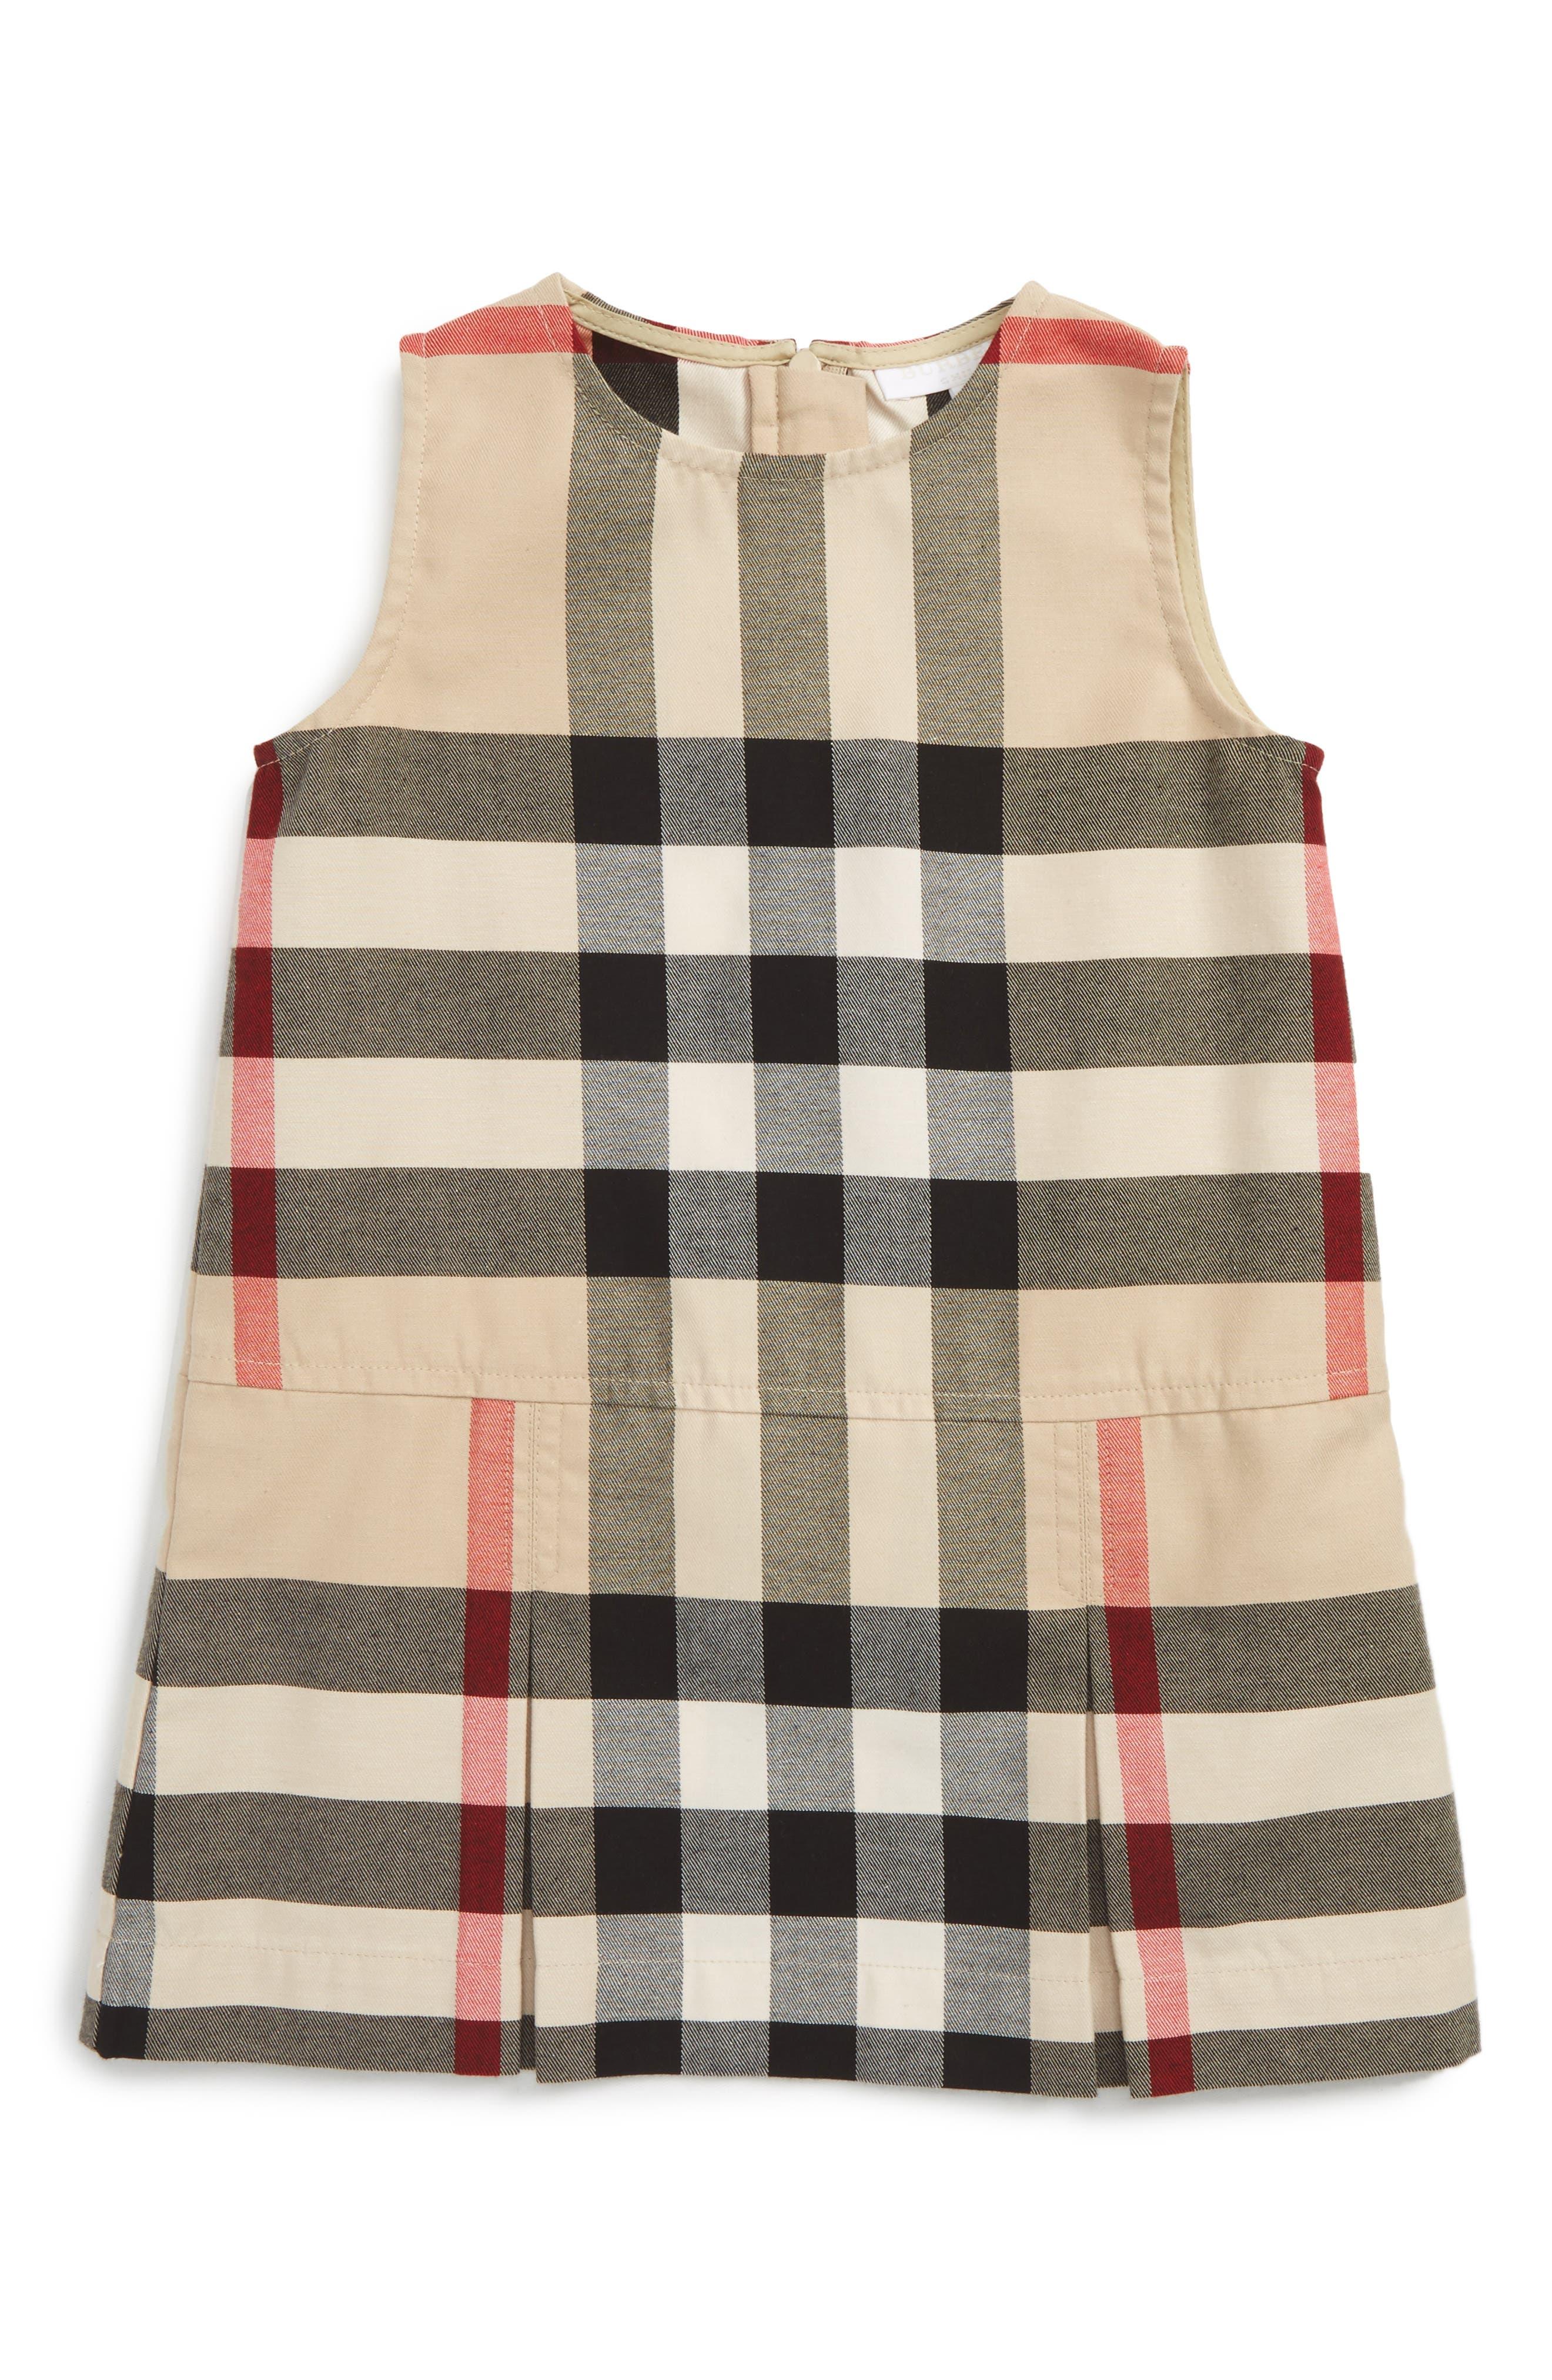 Main Image - Burberry Dawny Check Print Sleeveless Dress (Baby Girls)